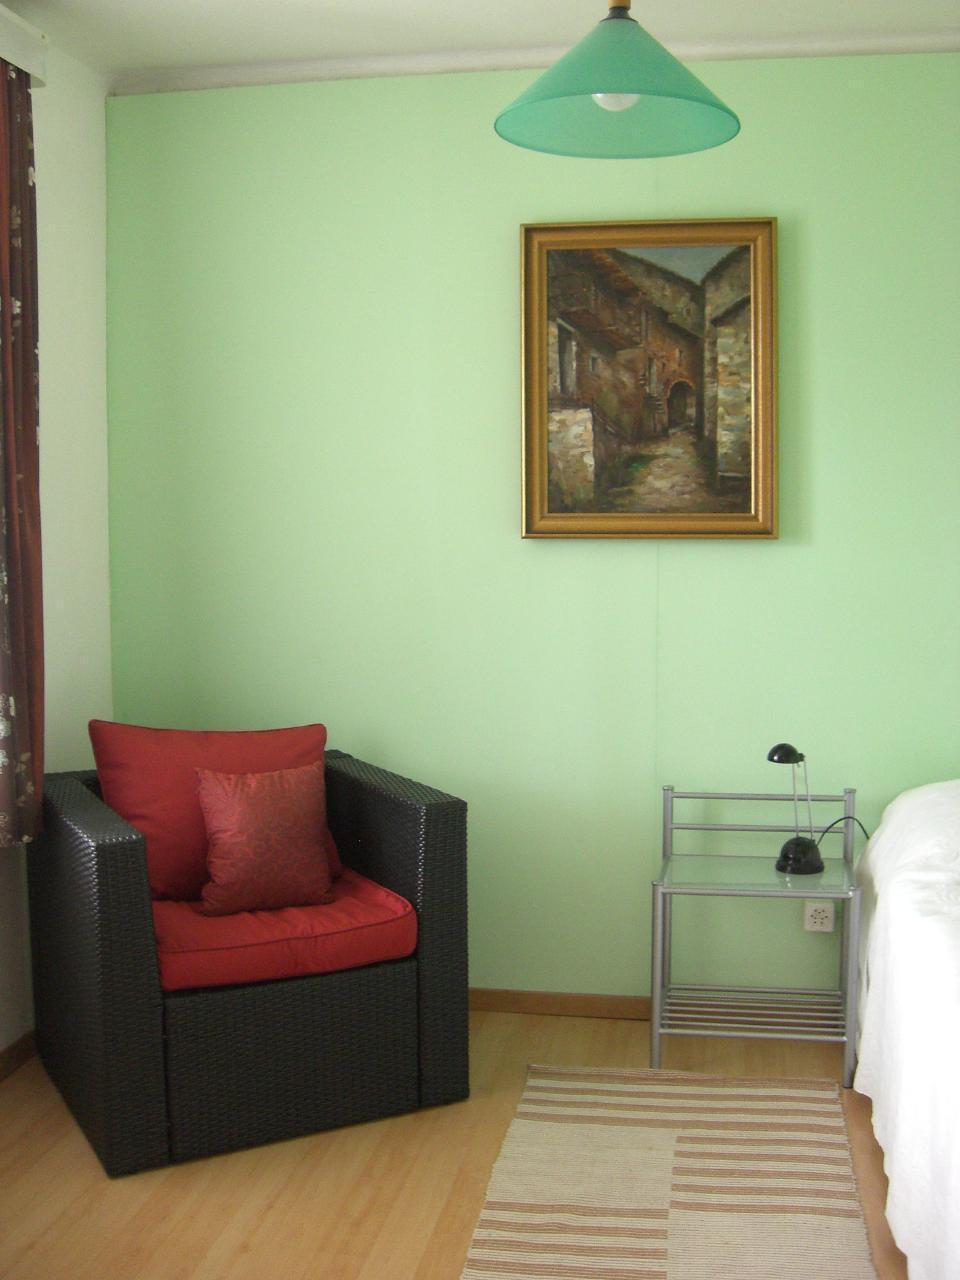 Holiday apartment ... zu Hause sicher -  unterwegs mit Bedacht... Il Réduit alle Rascane Orselina, Giardino (192974), Orselina, Lake Maggiore (CH), Ticino, Switzerland, picture 9